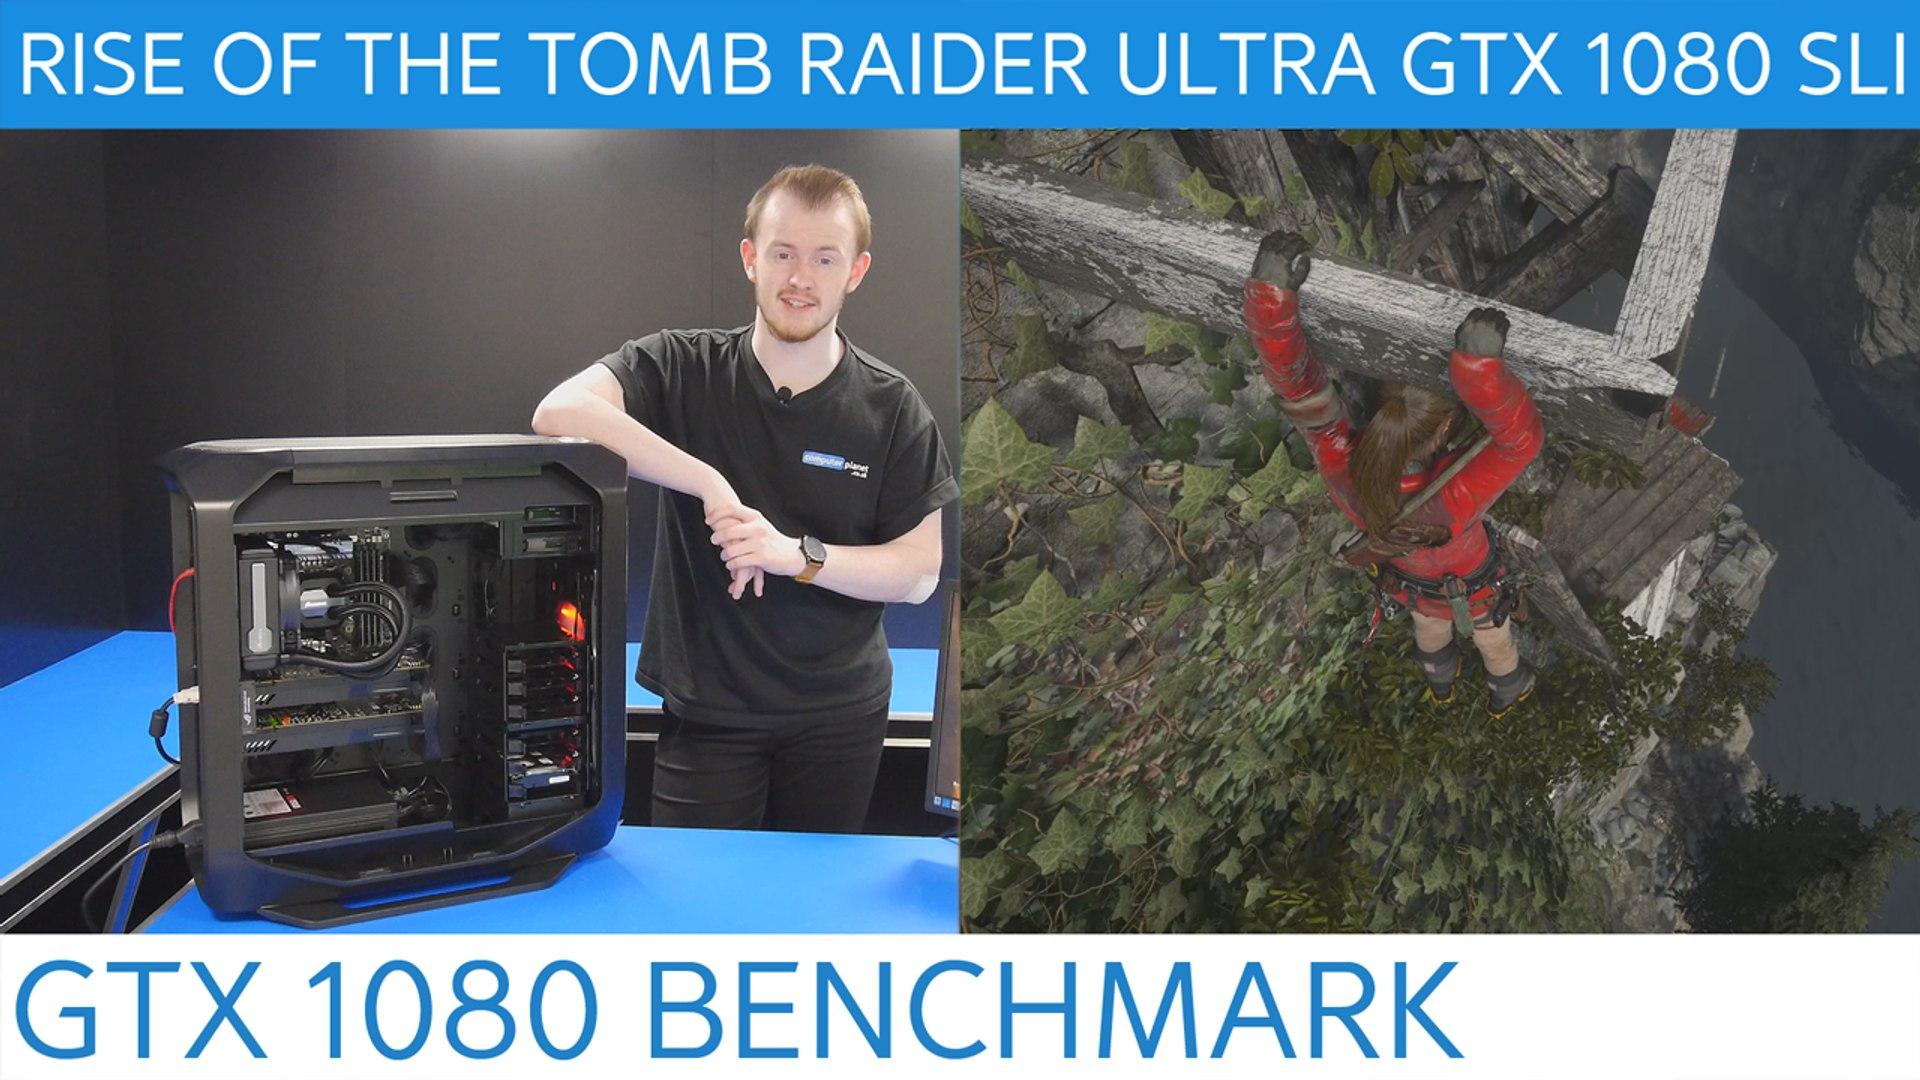 RISE OF THE TOMB RAIDER ULTRA GTX 1080 SLI BENCHMARK